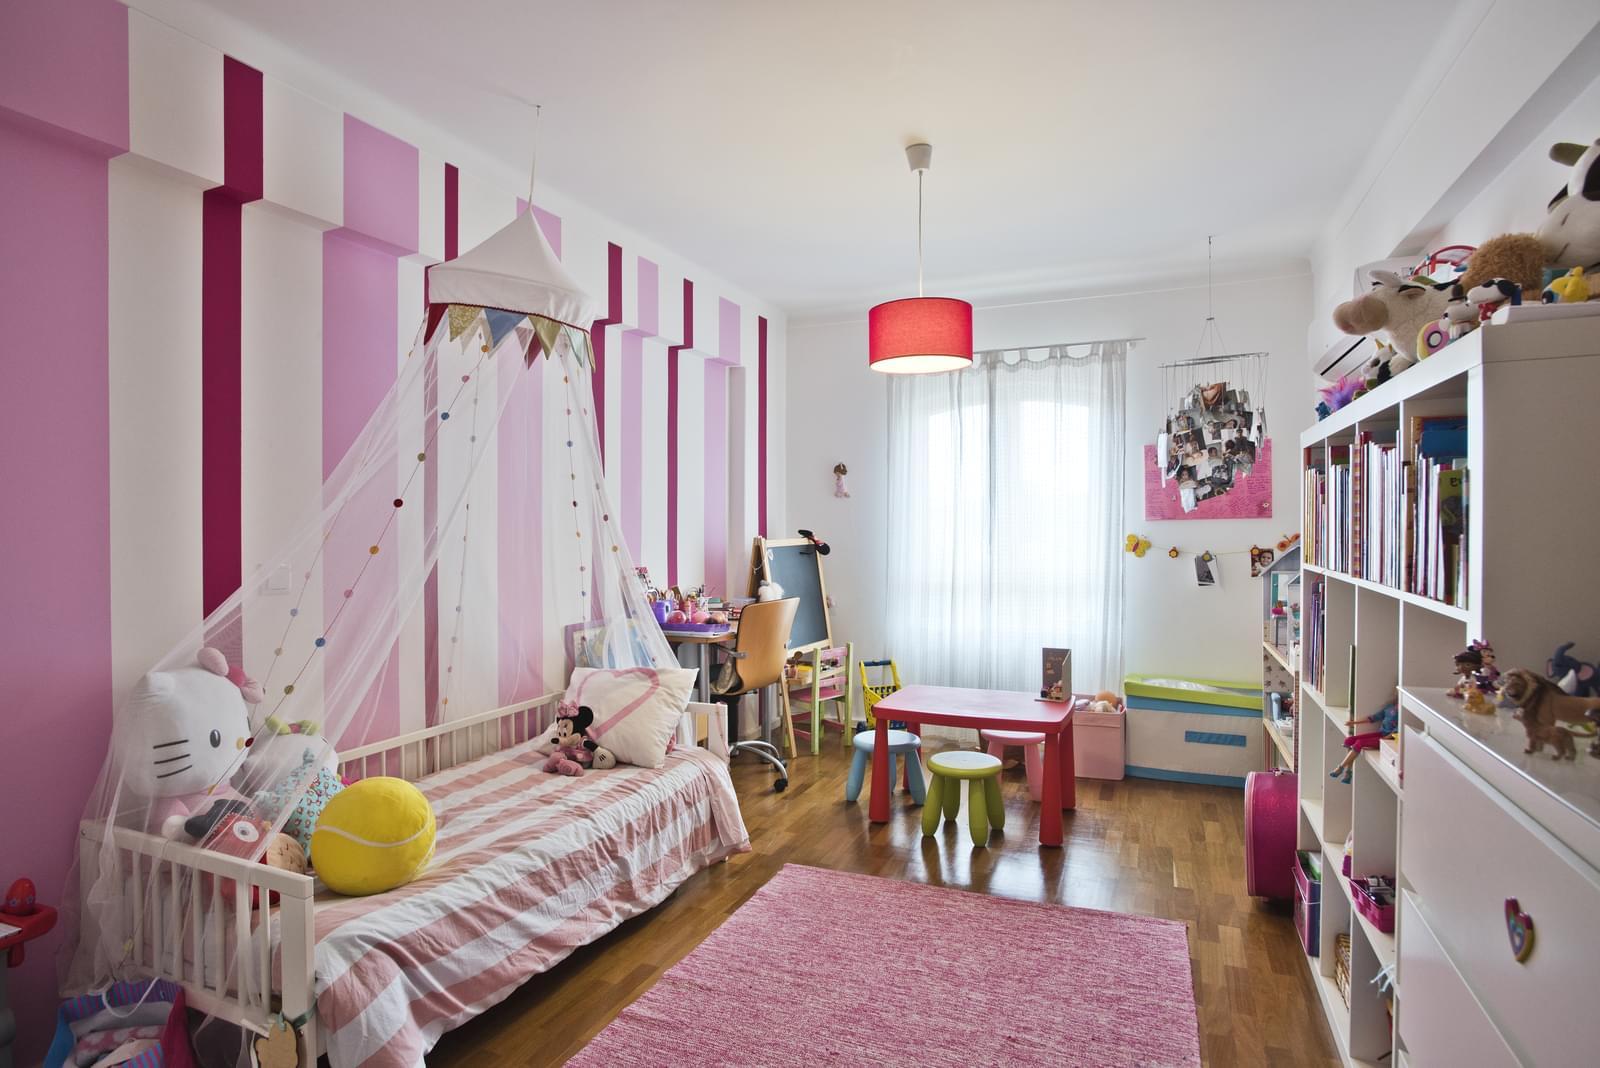 pf17230-apartamento-t3-cascais-df785bc4-c39c-4770-8fcf-0f19b5fe8107